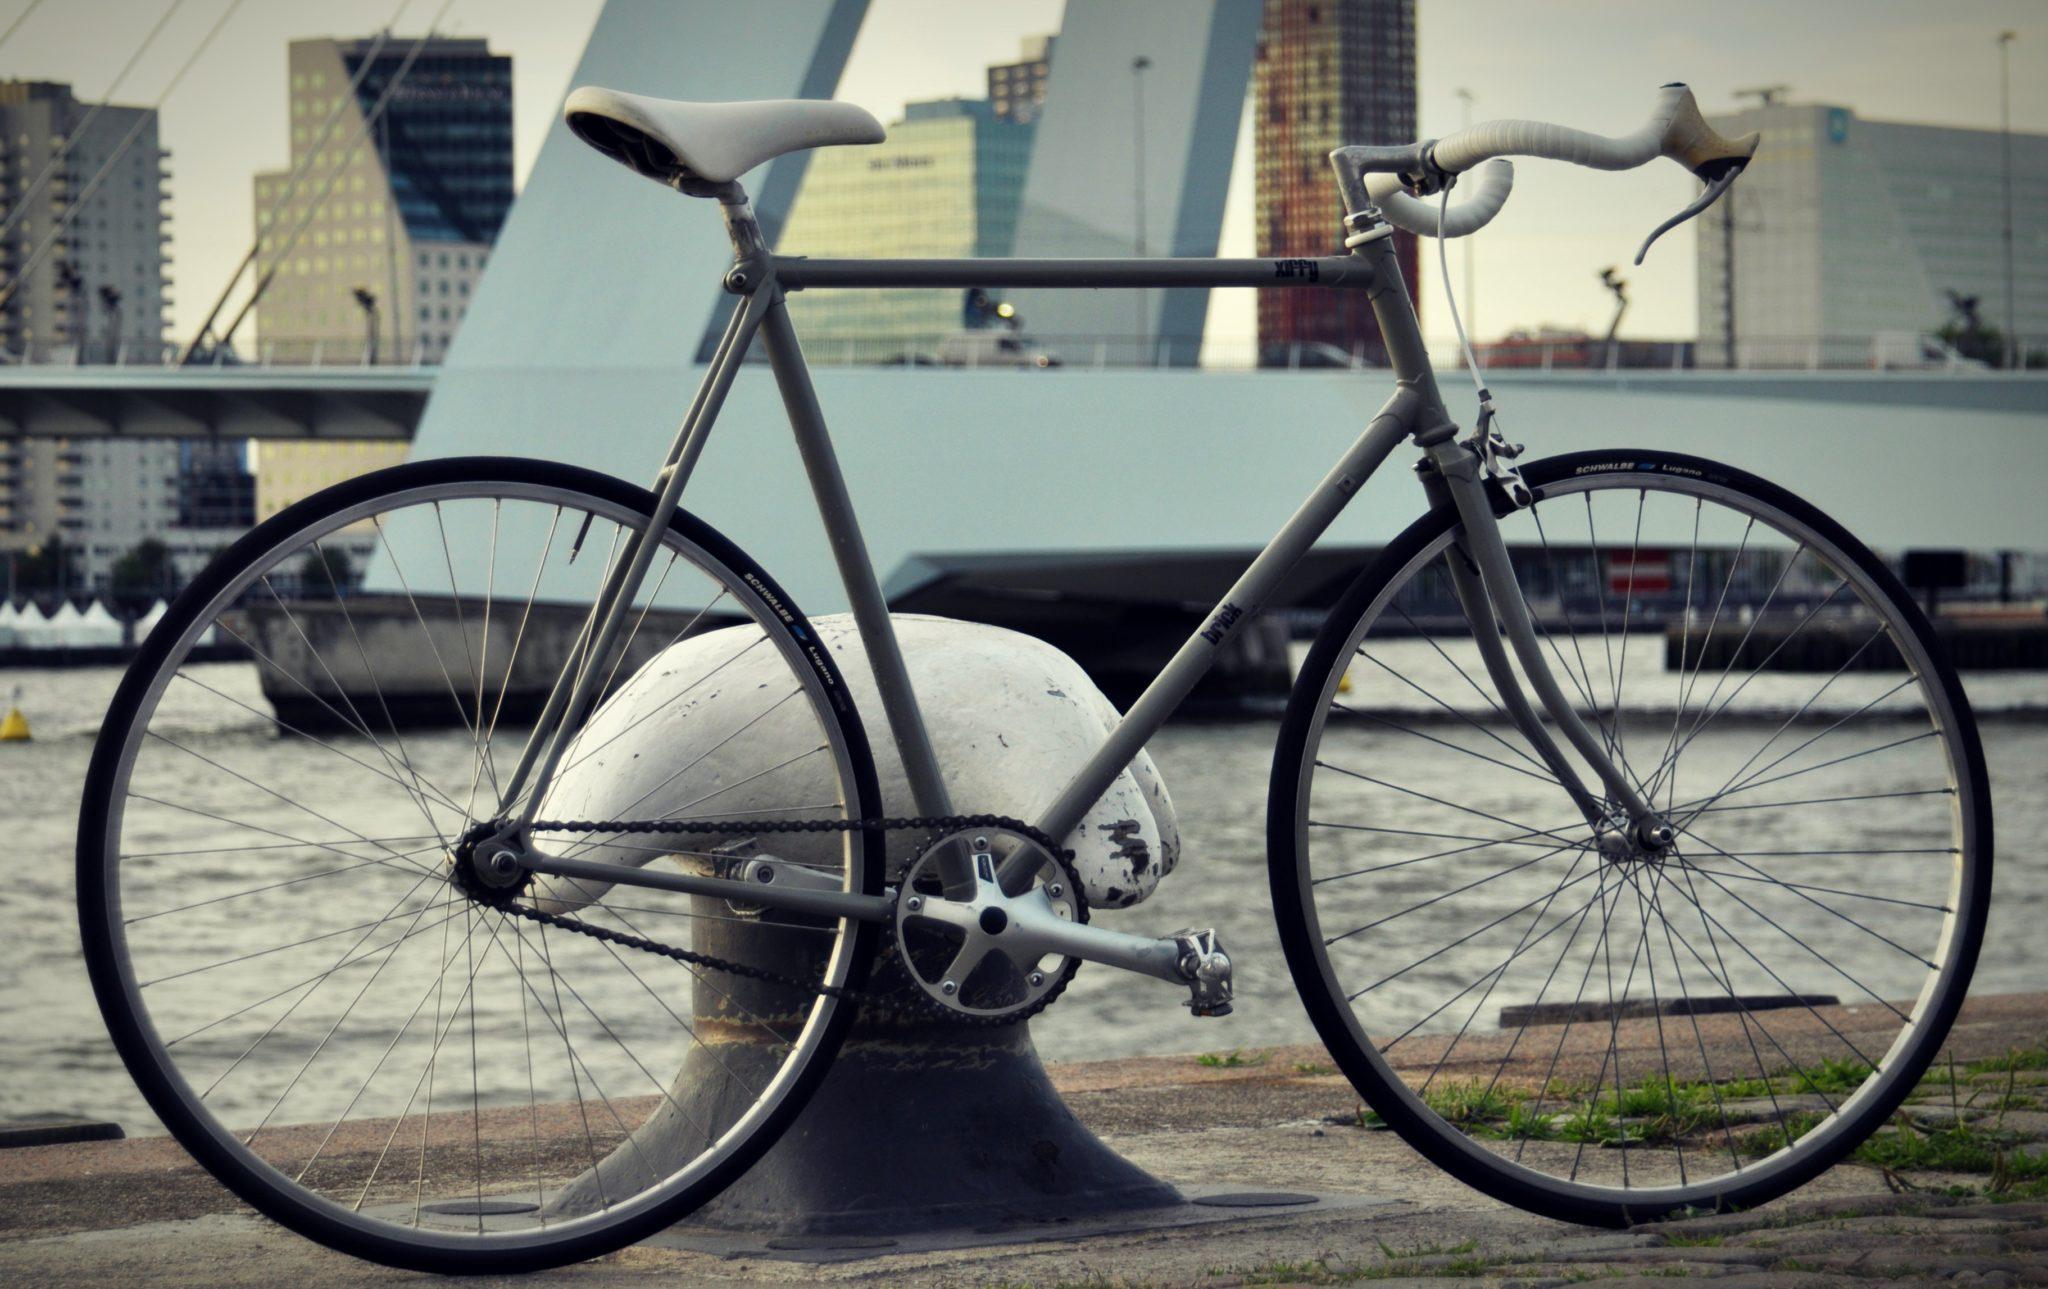 Retrospec Fixed-Gear Crank Single-Speed Road Bicycle